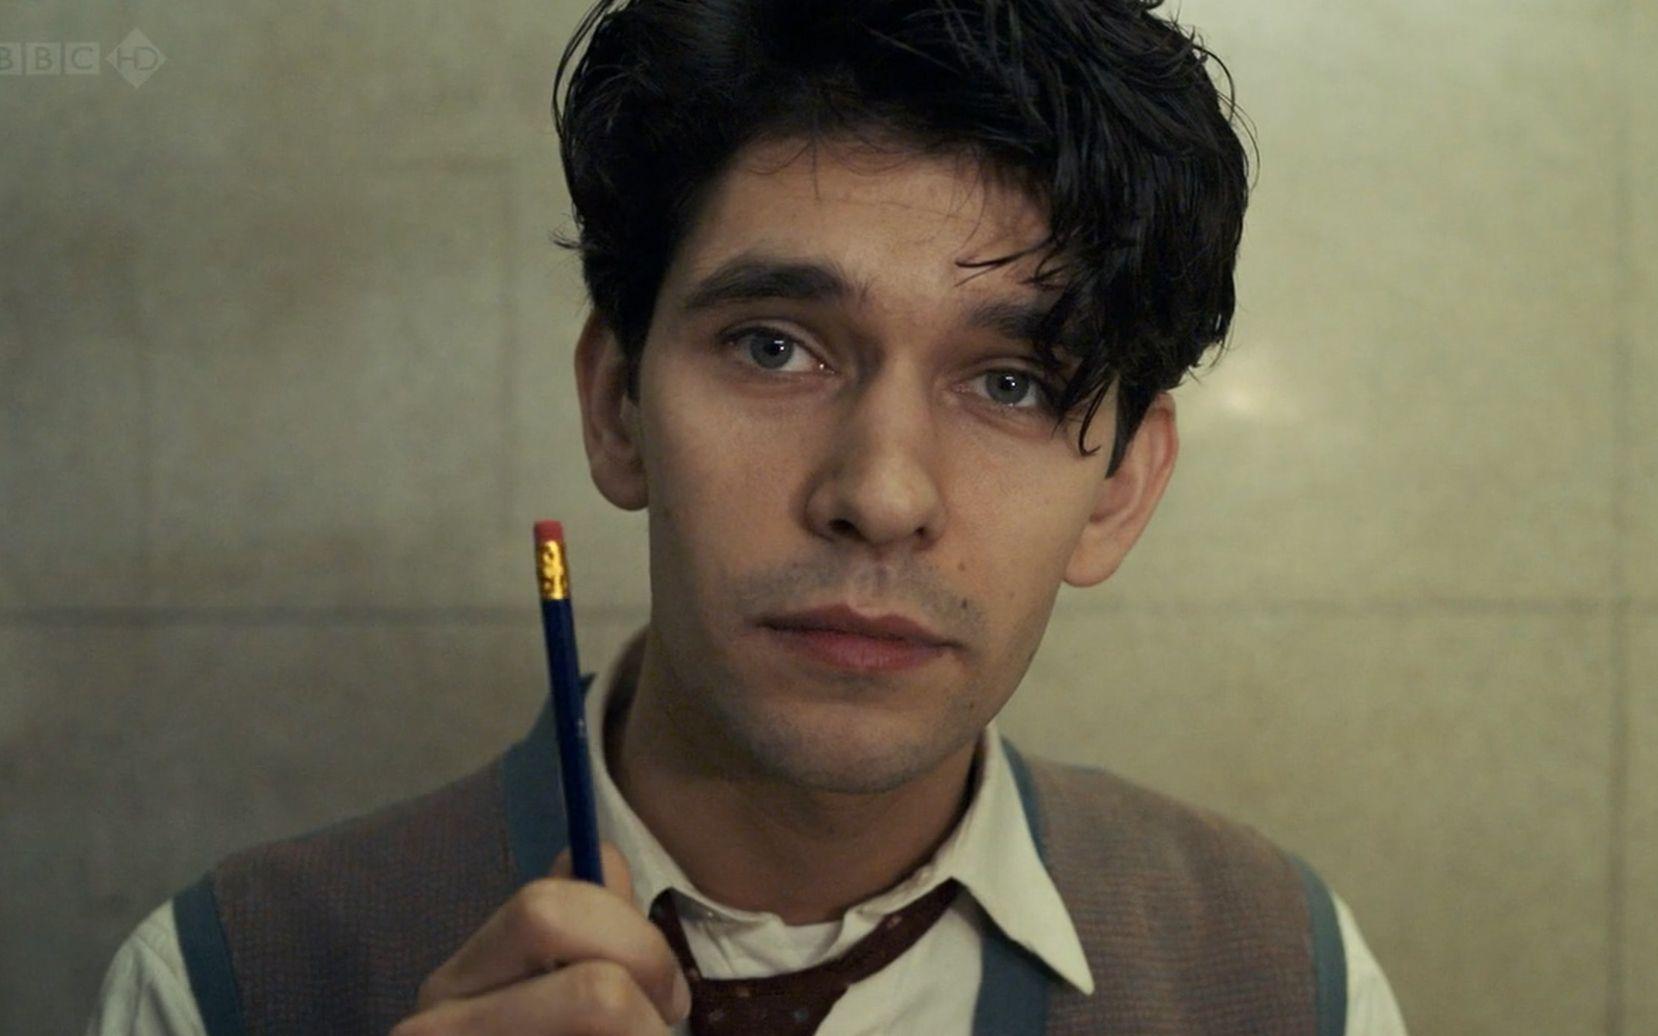 Ben Whishaw将出演BBC两部AMC系列剧《这将要受伤》